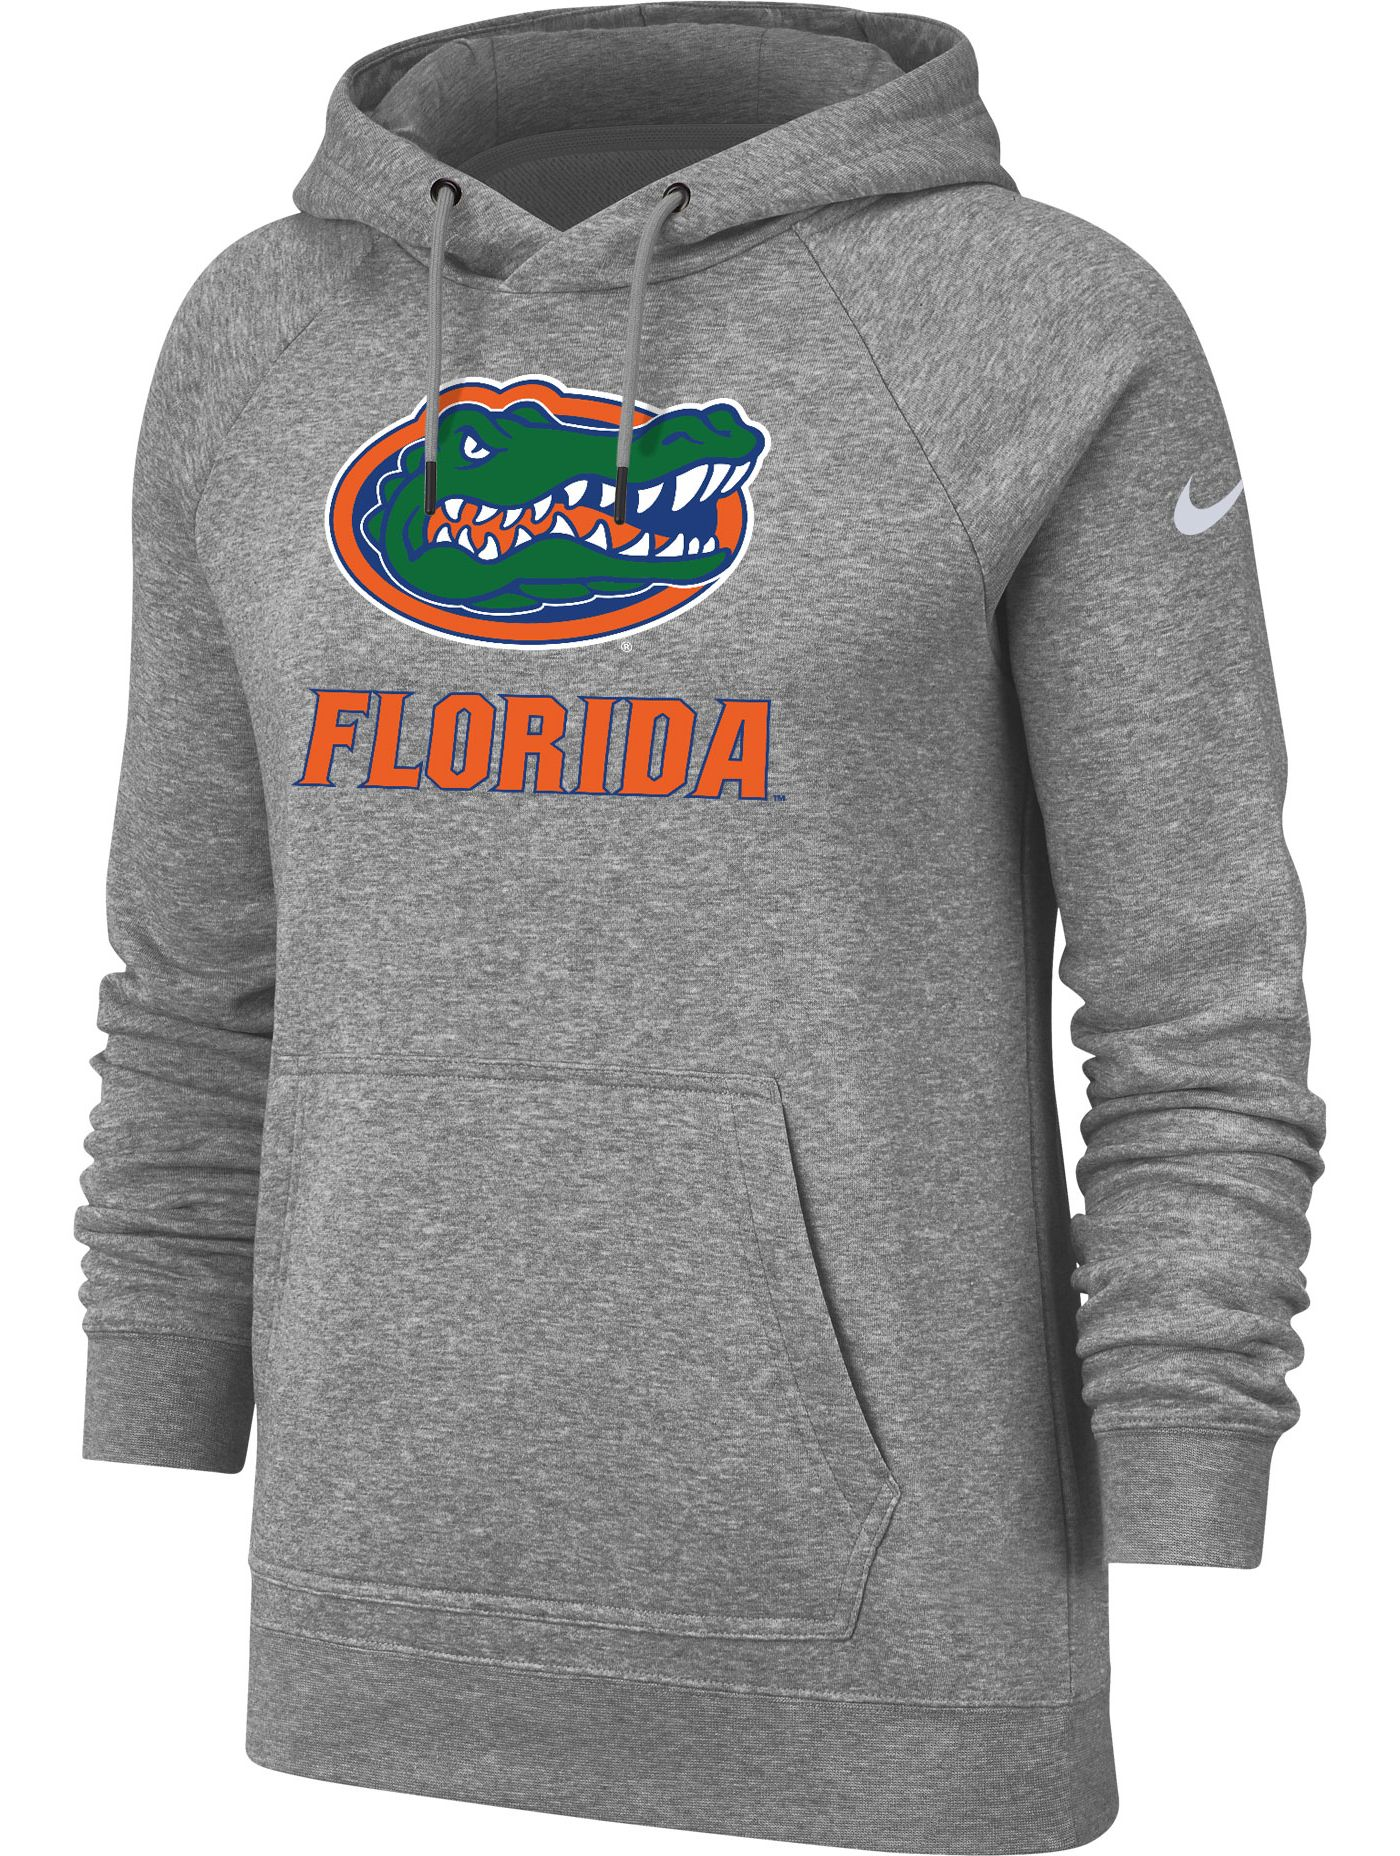 Nike Women's Florida Gators Grey Rally Pullover Hoodie